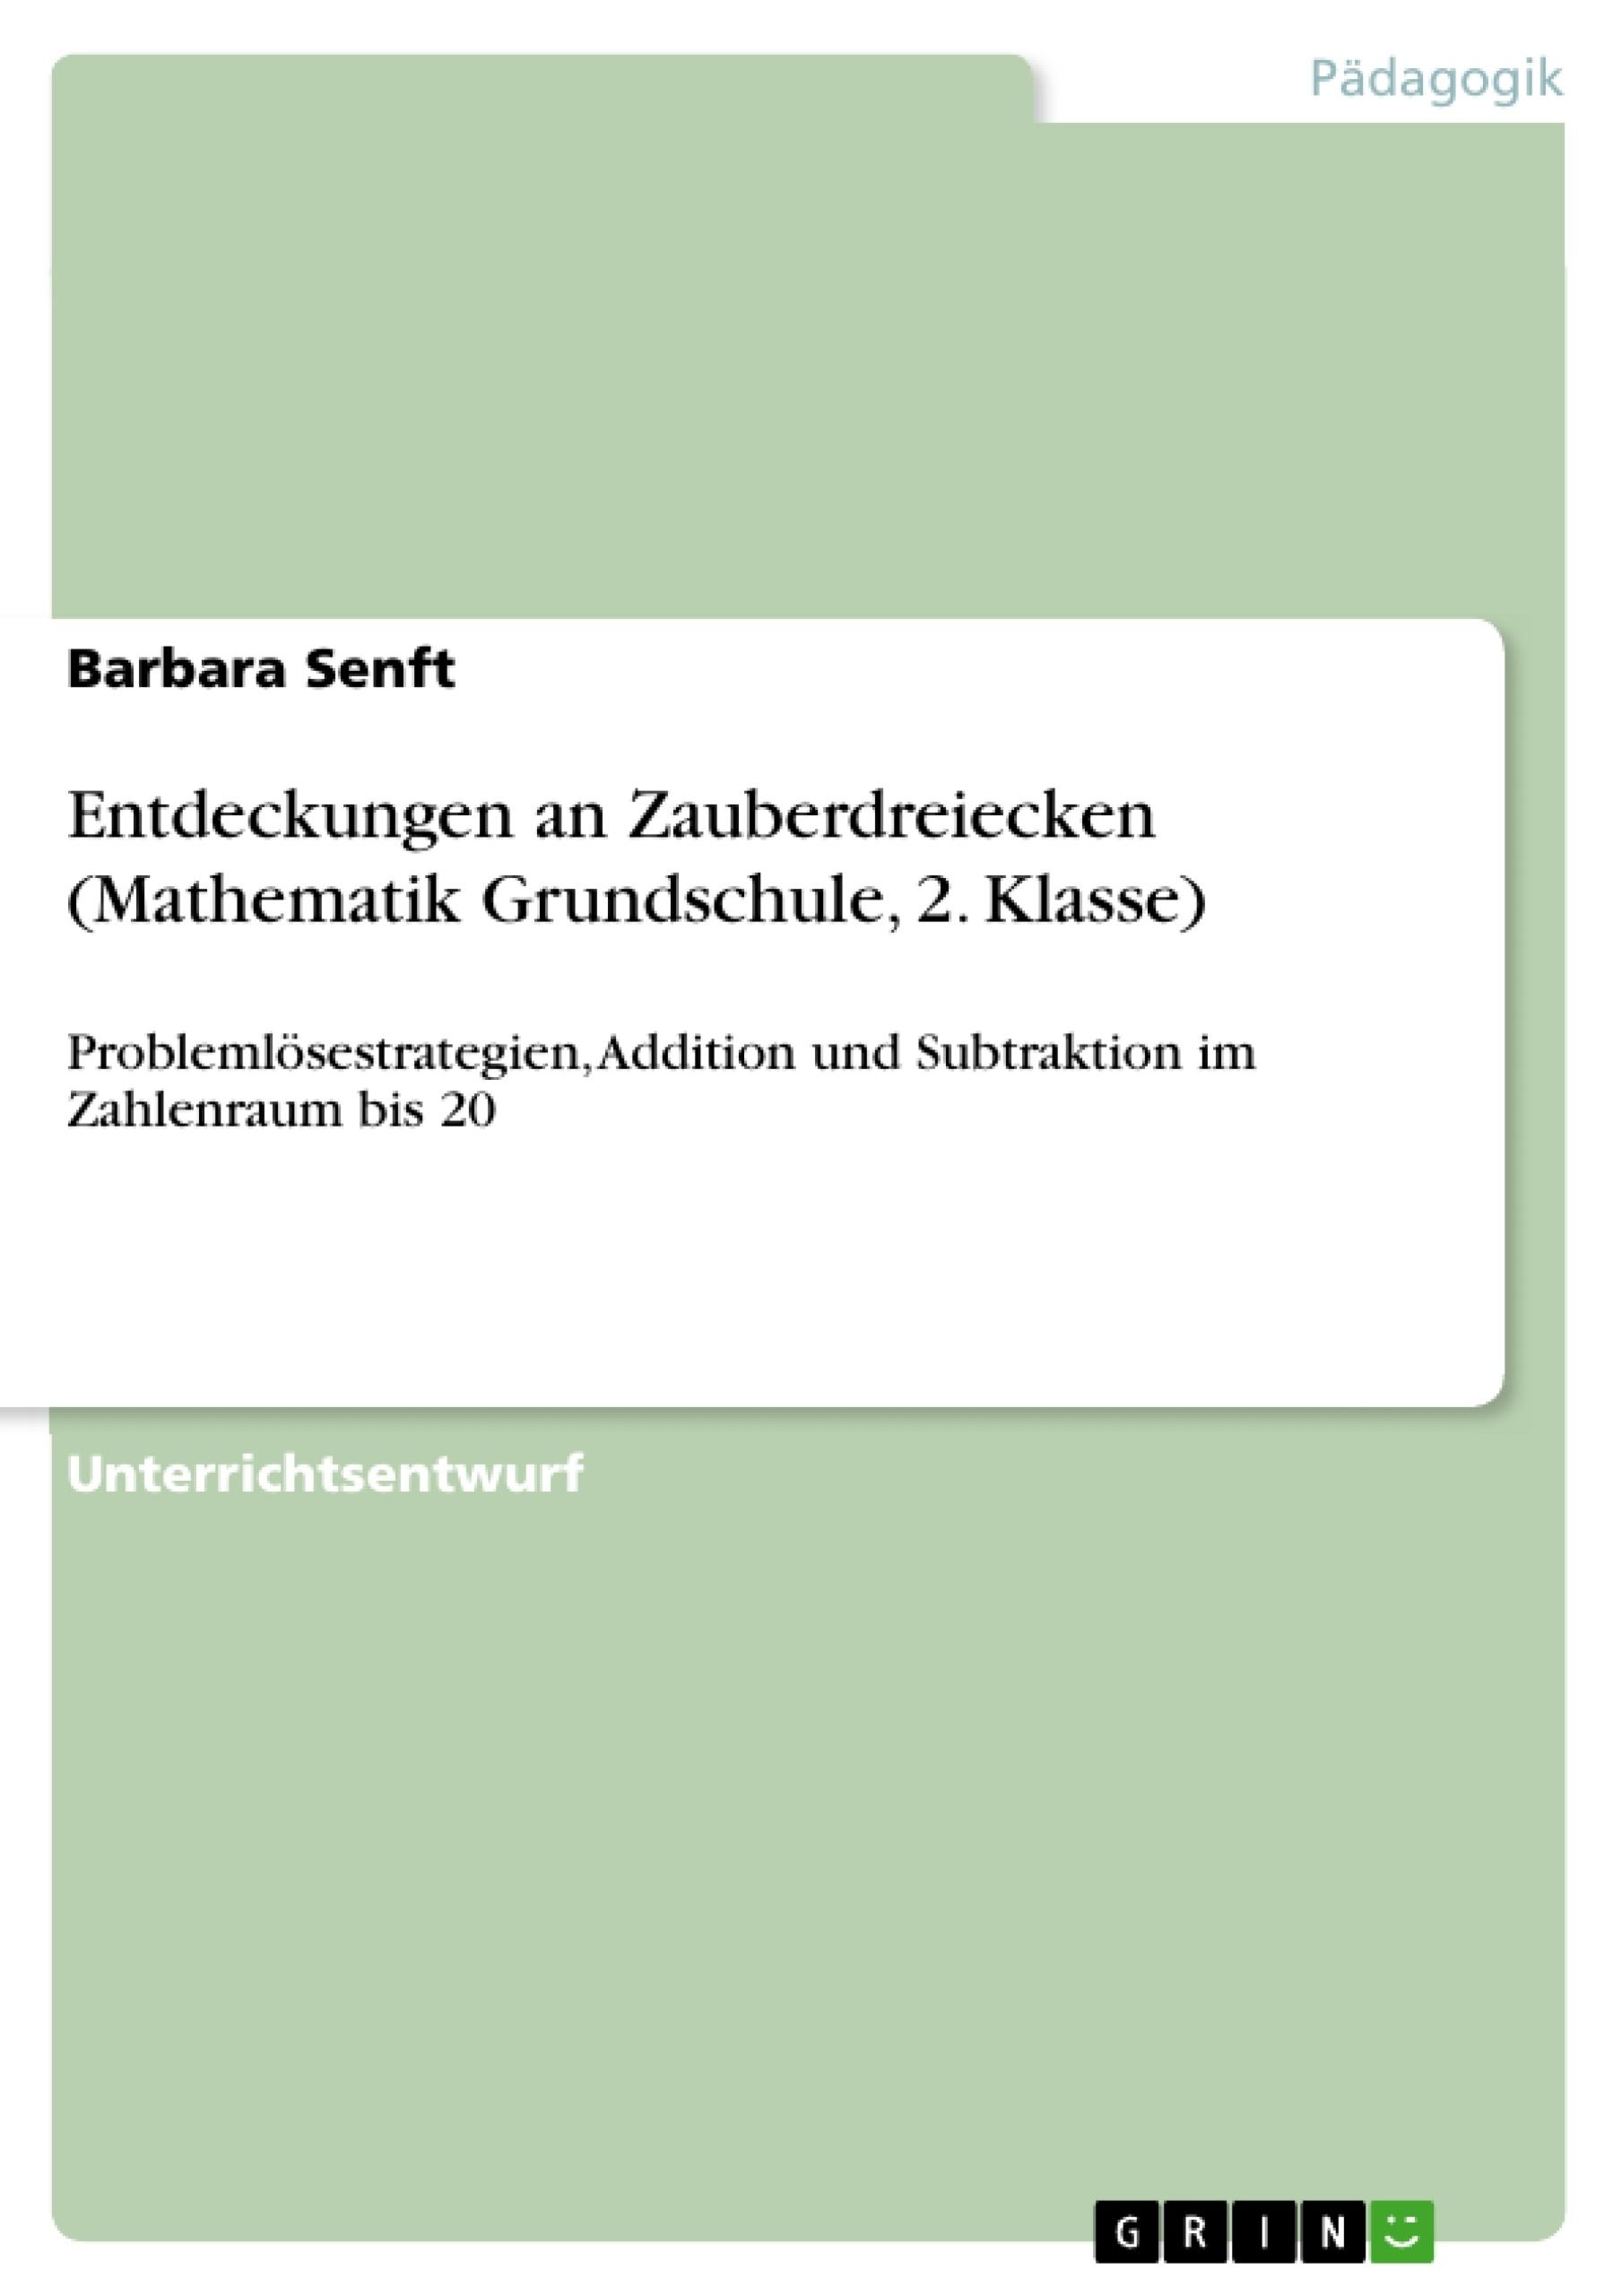 Titel: Entdeckungen an Zauberdreiecken (Mathematik Grundschule, 2. Klasse)